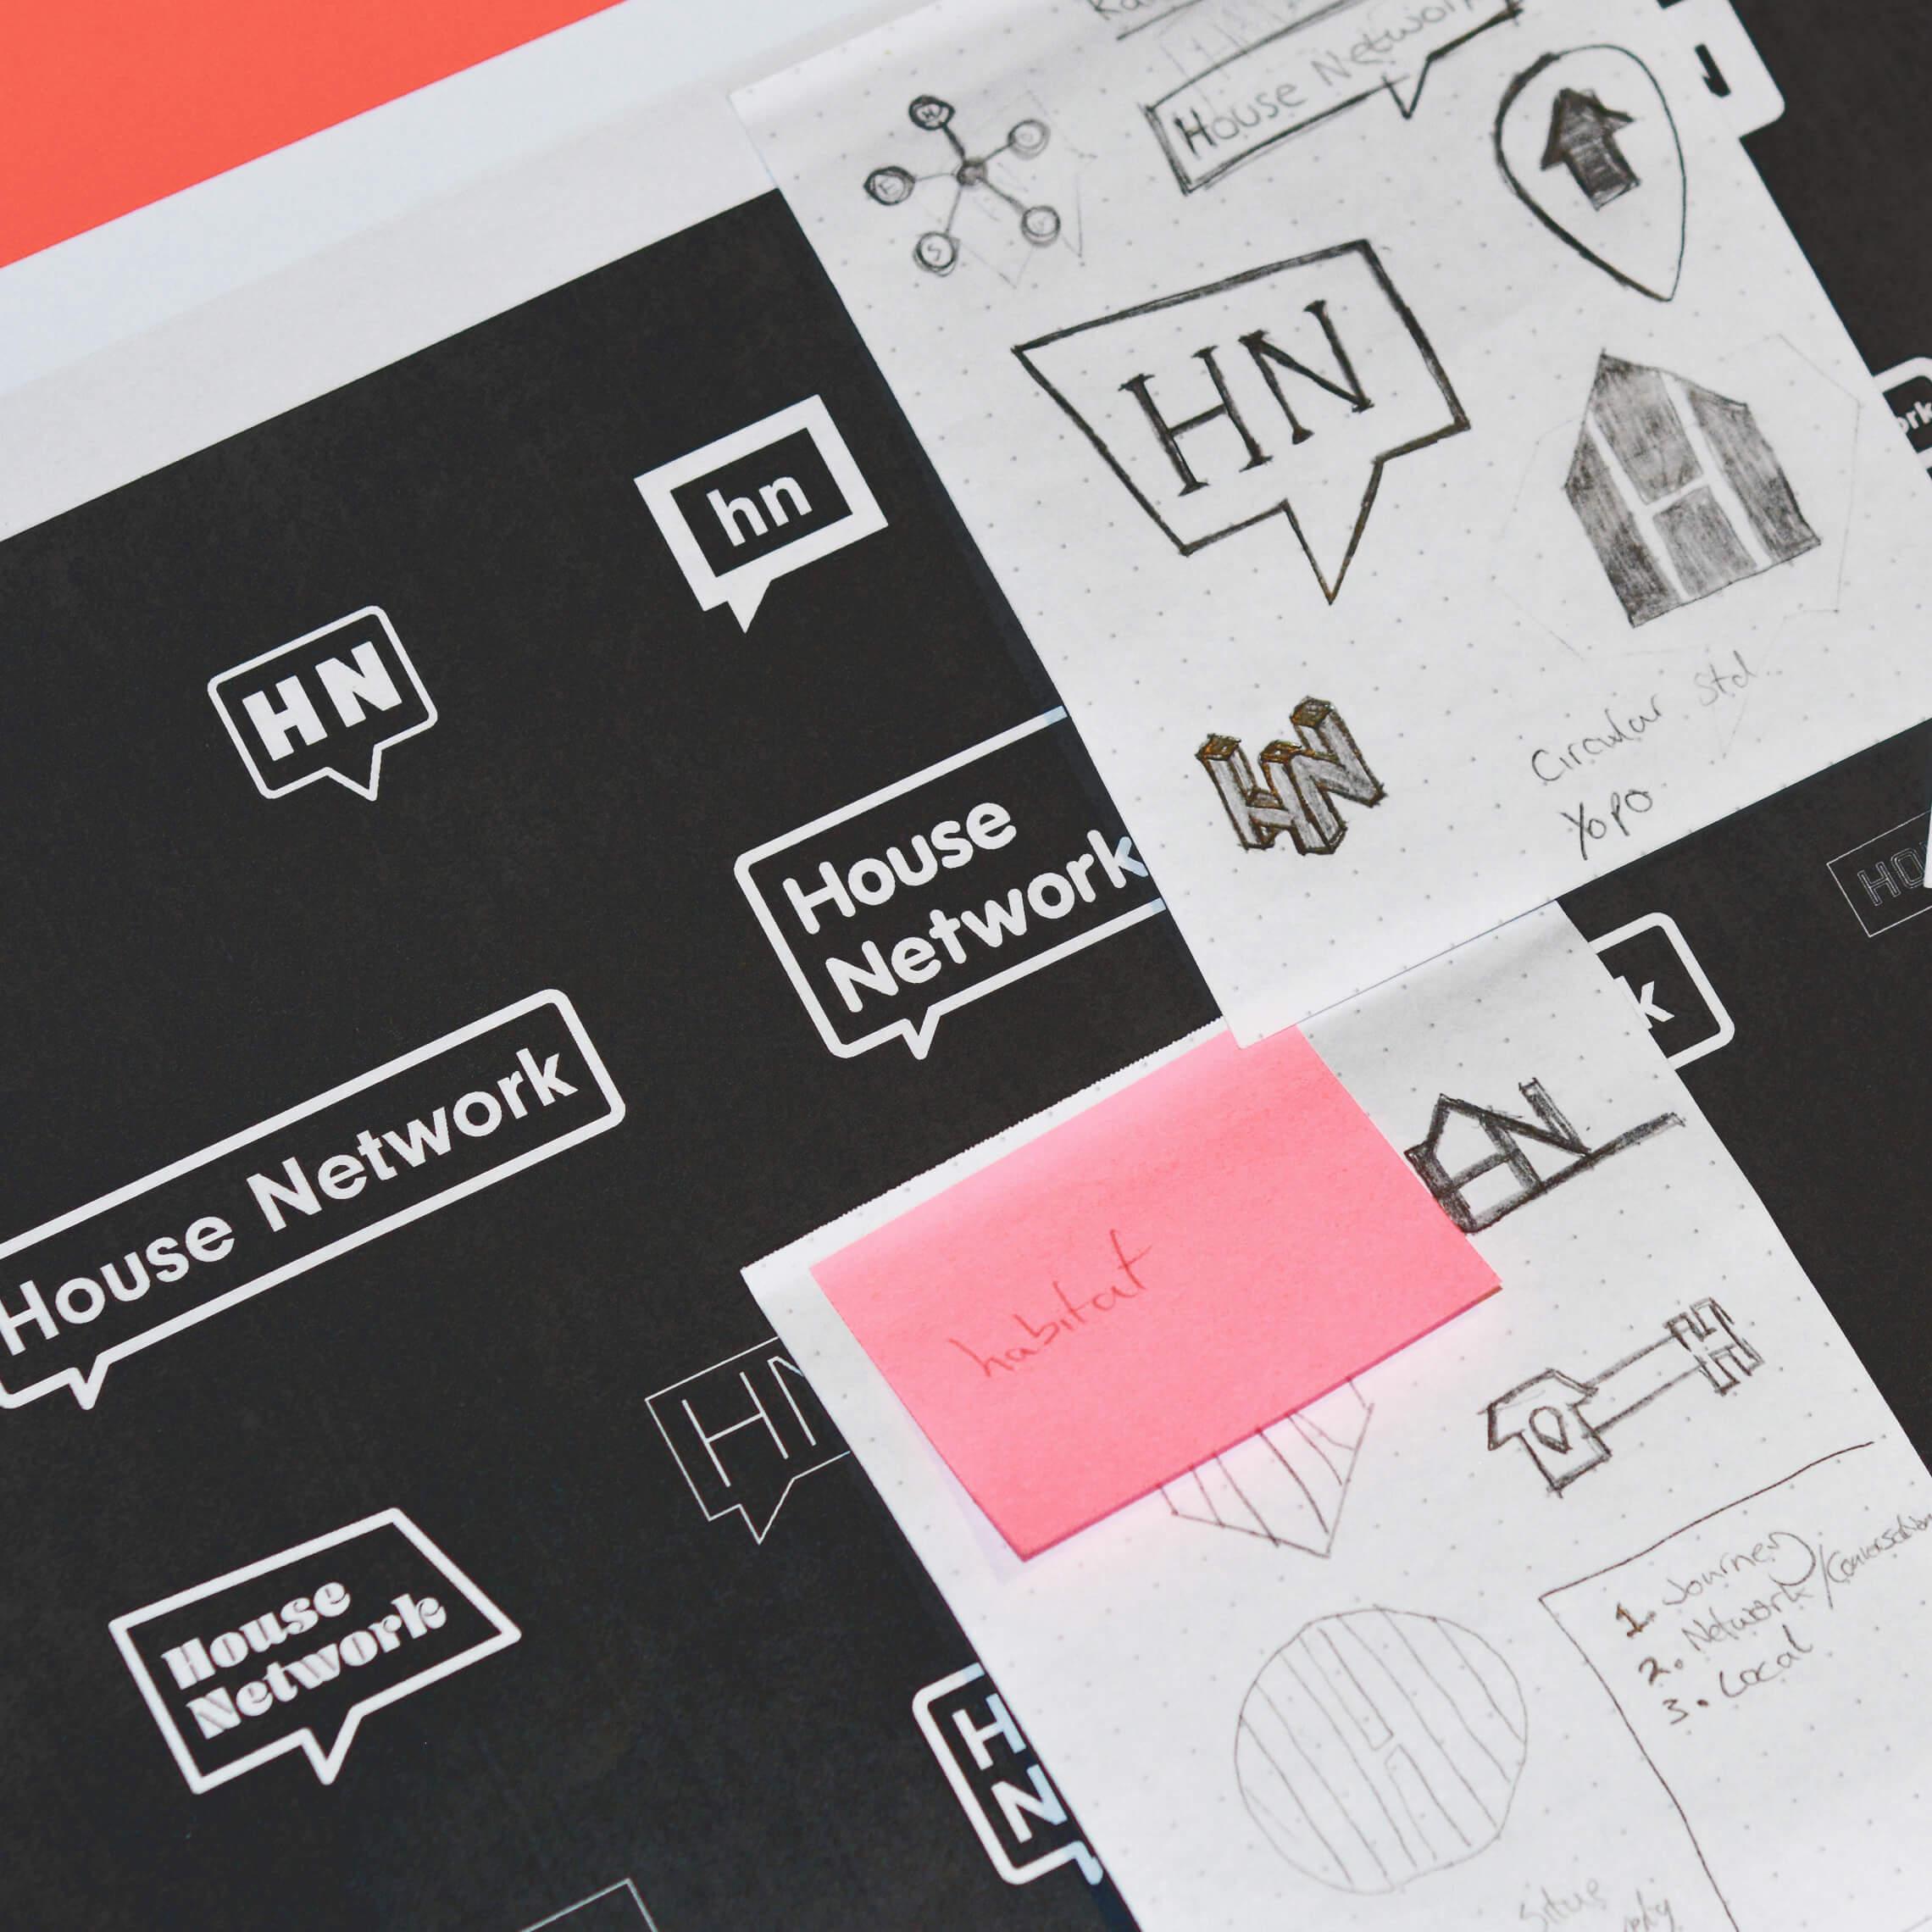 house_network_logo_process_3